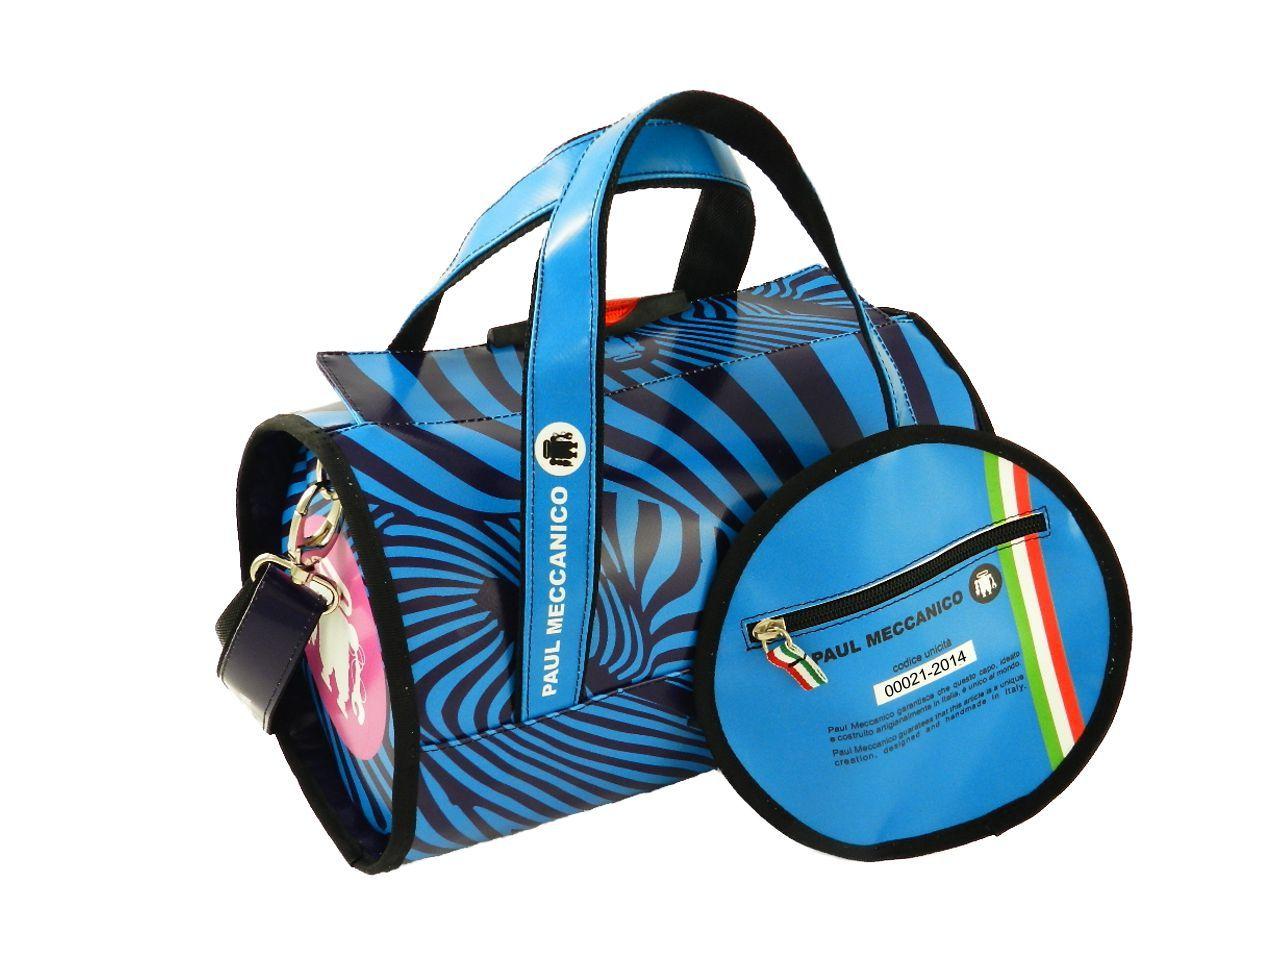 a96a174b65 Borsa bauletto Paul Meccanico azzurra fantasia zebrata.   MINI ...